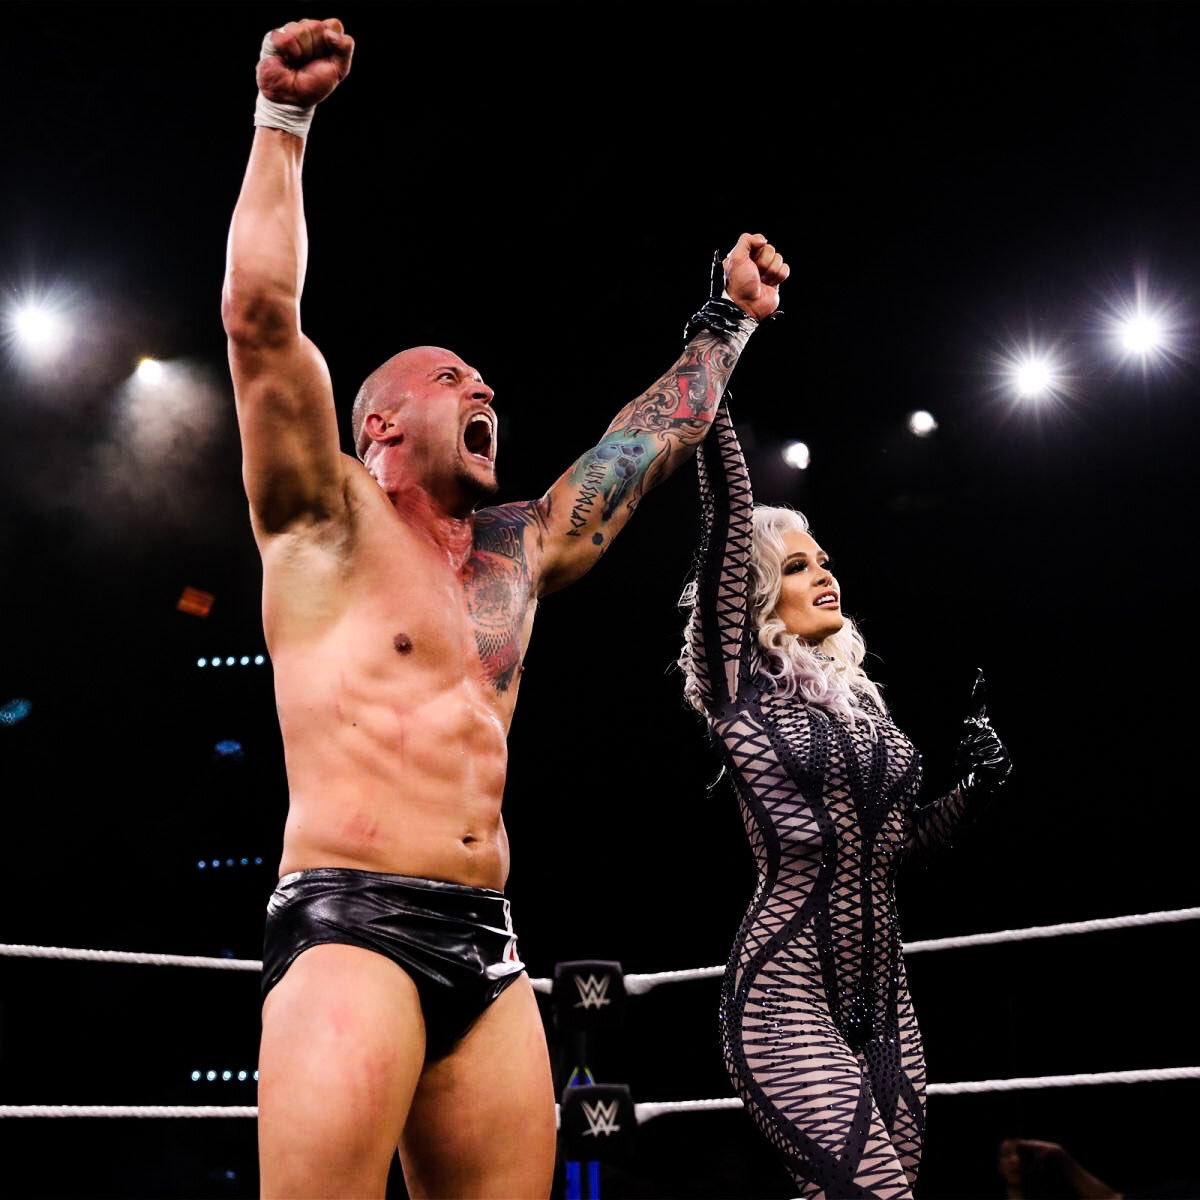 Photo: WWE NXT Hottie Scarlett's New Bikini Post Over Boyfriend's TakeOver Win 1